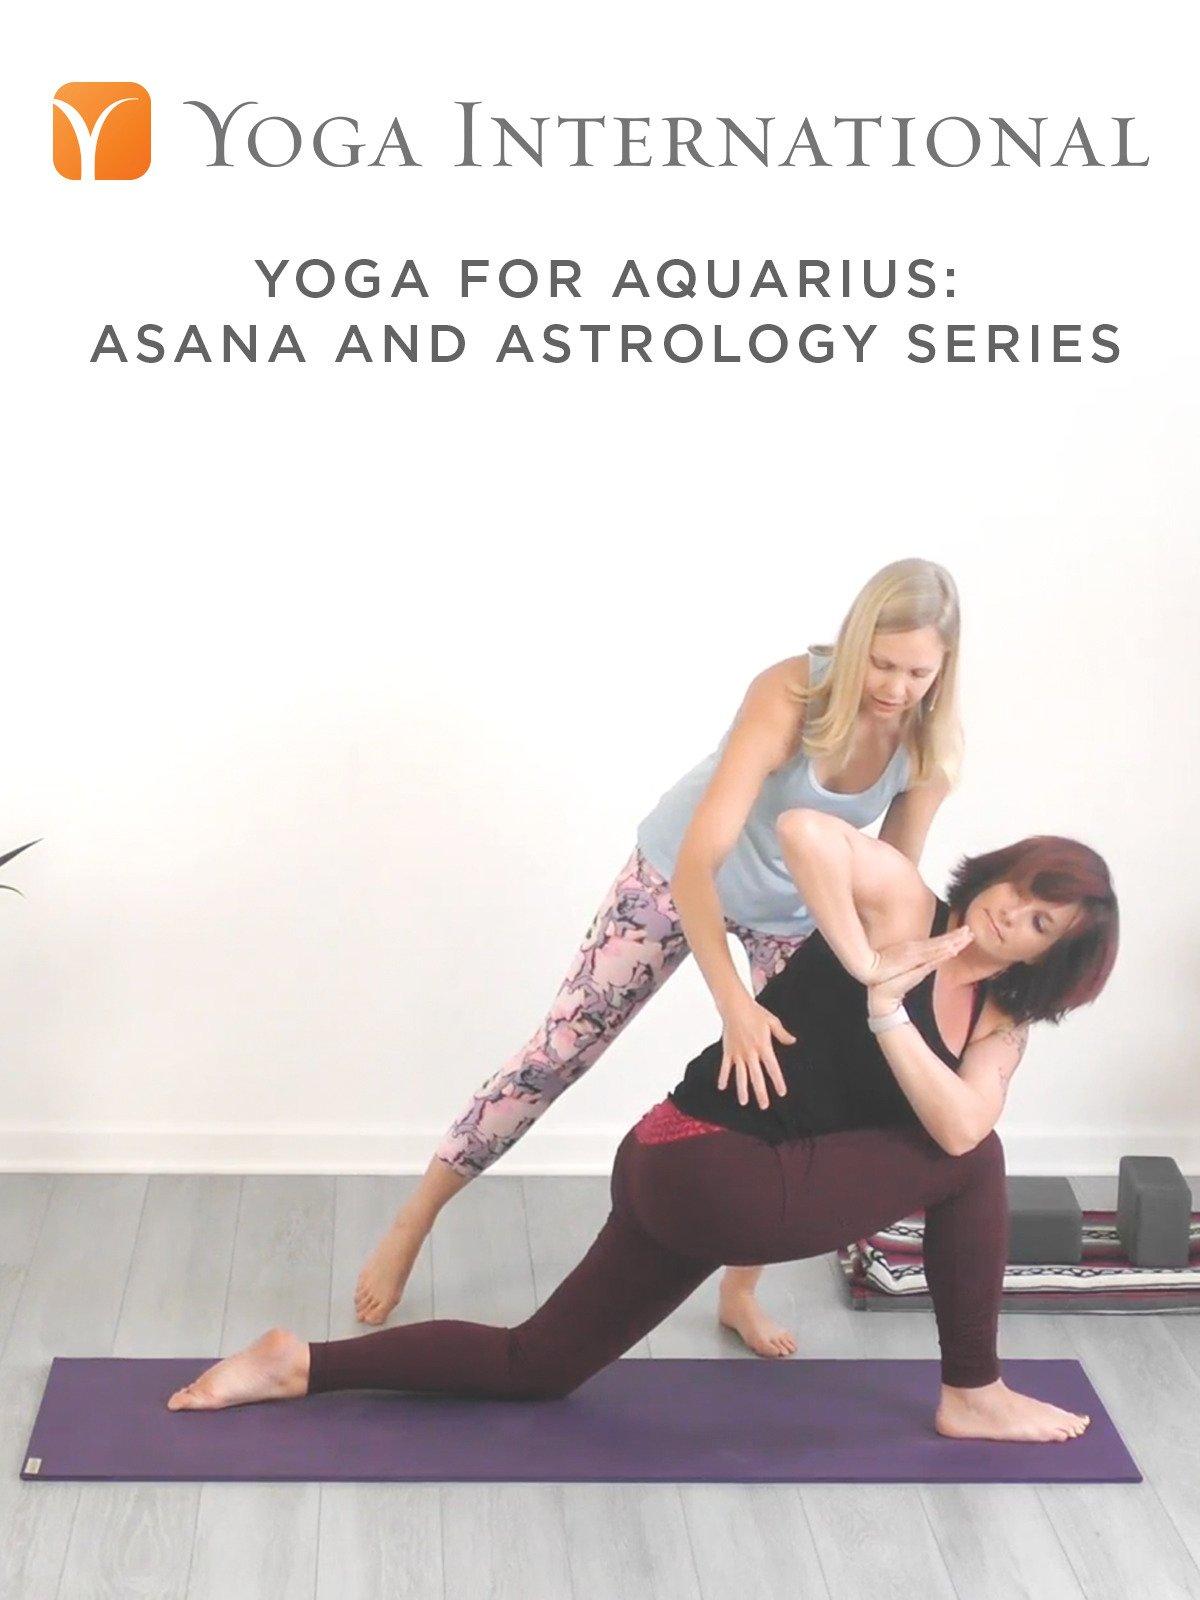 Yoga for Aquarius: Asana and Astrology Series